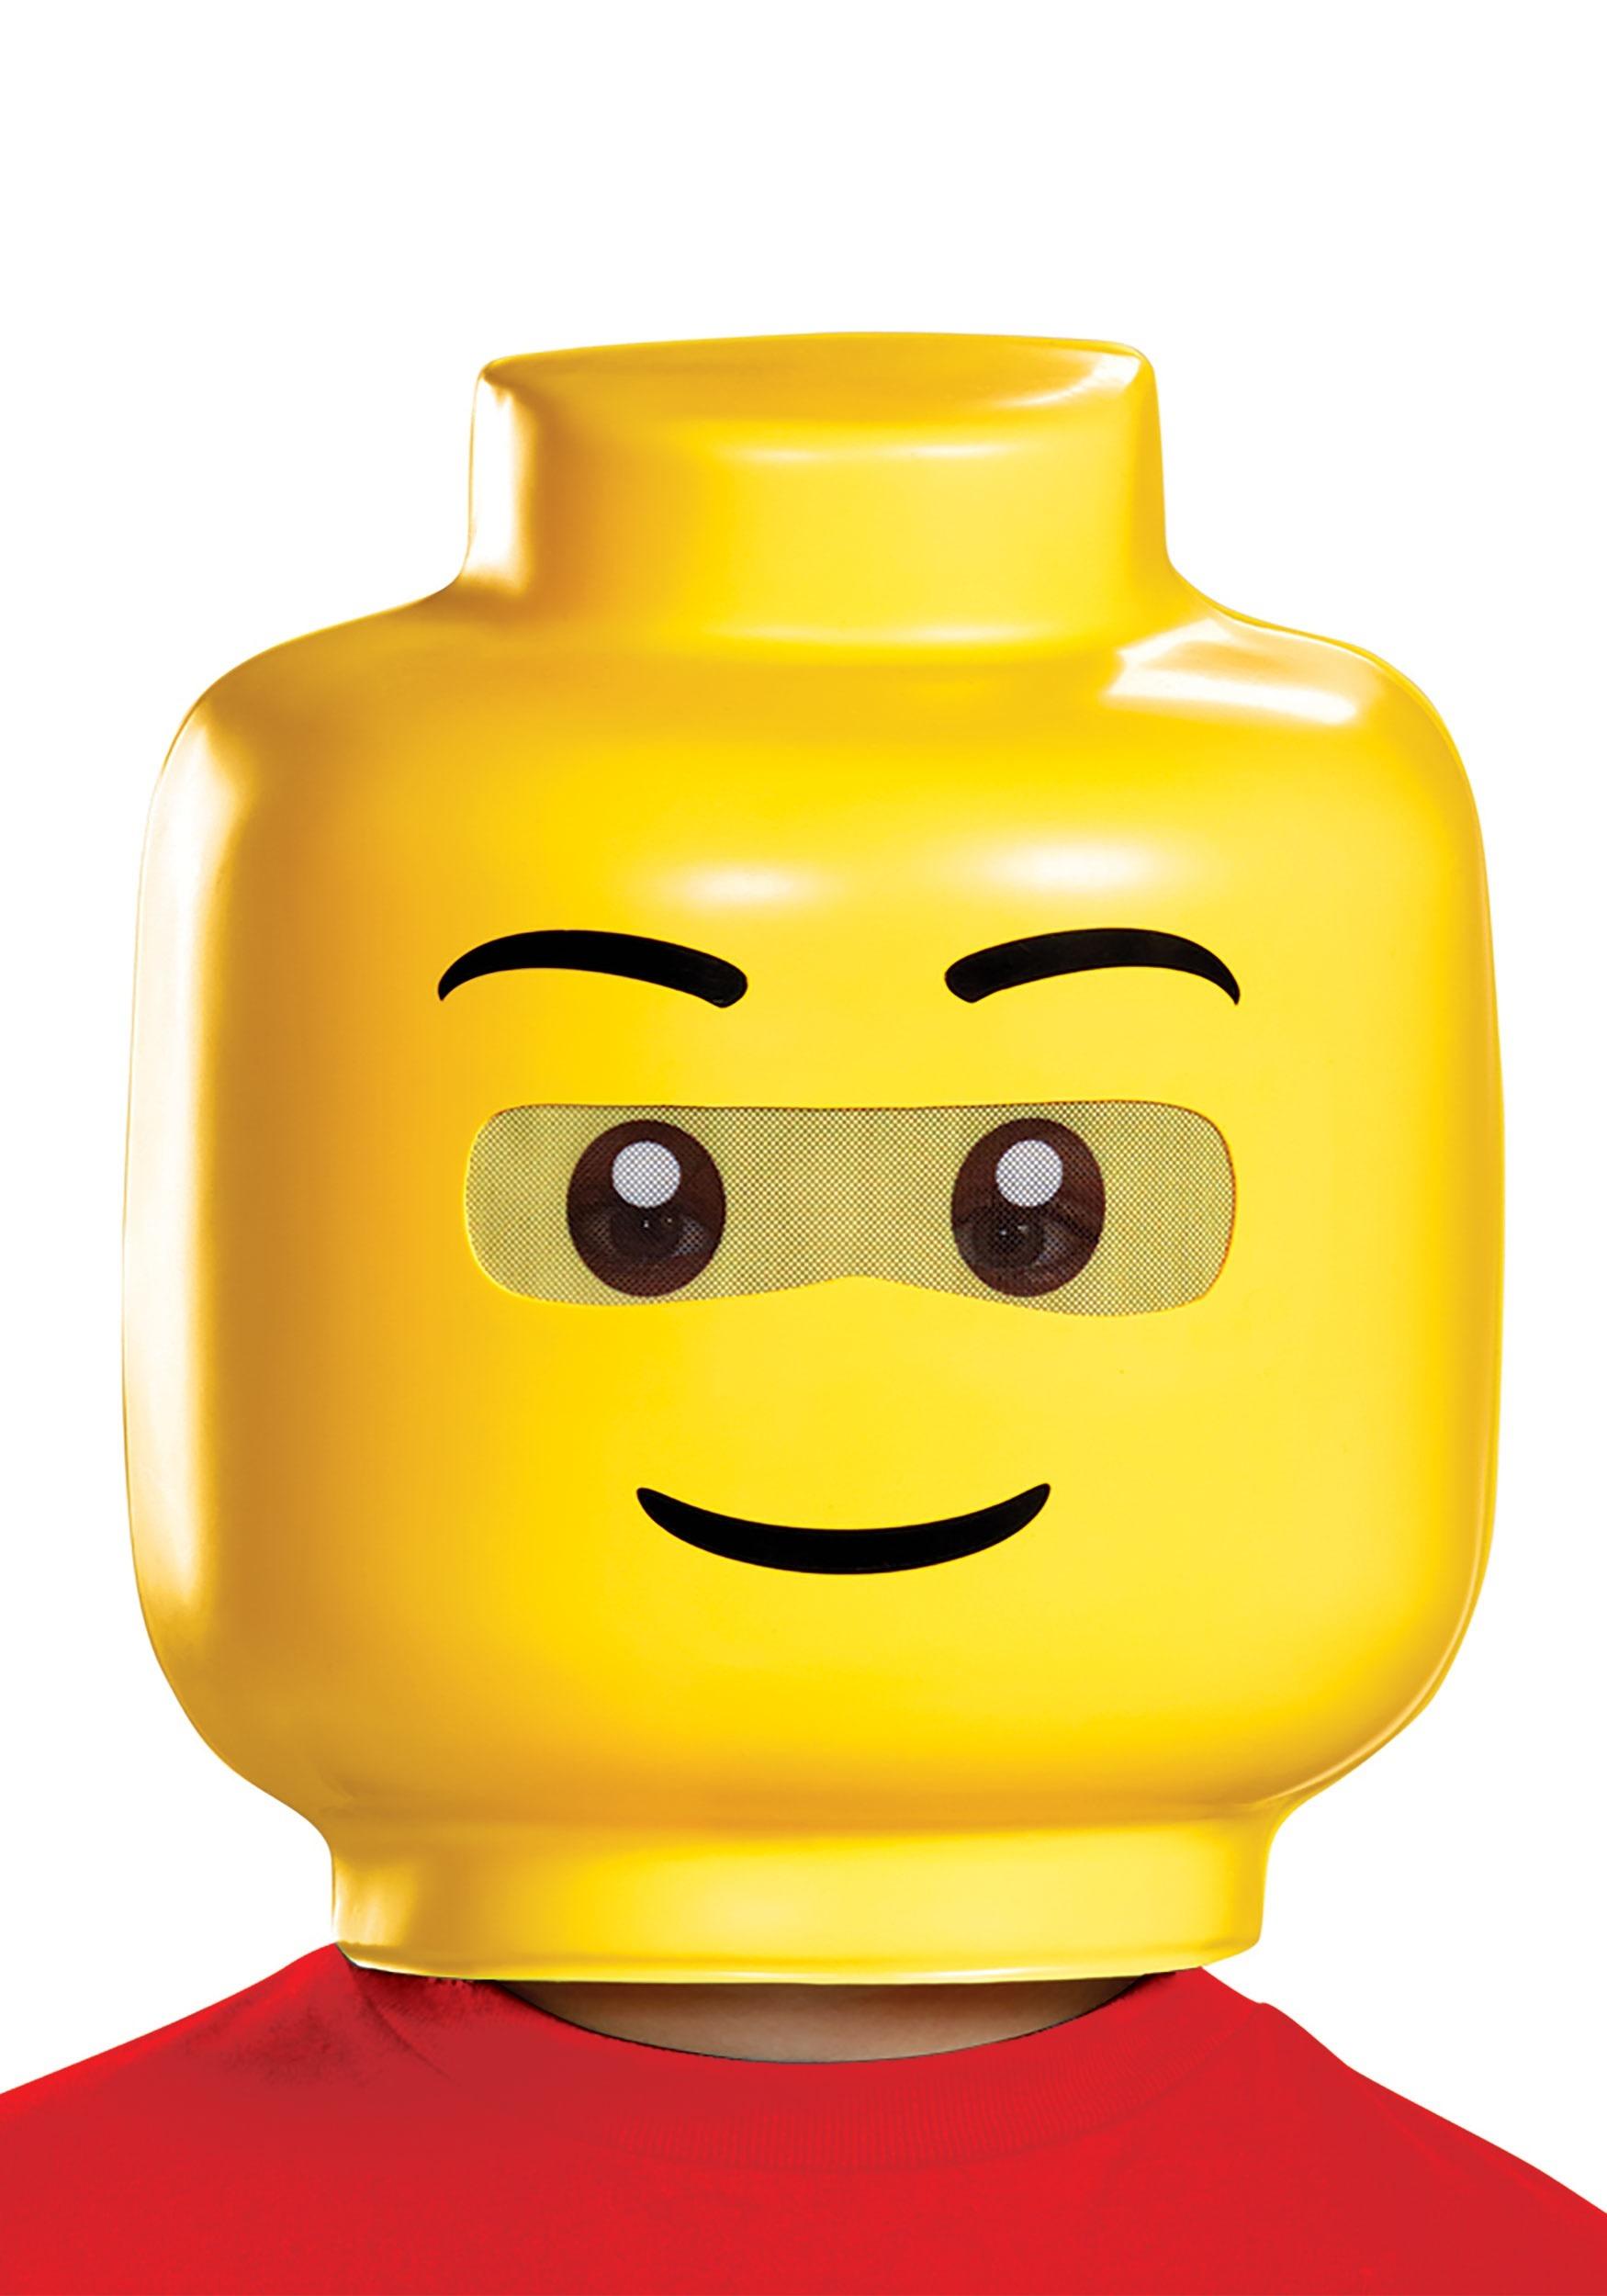 LEGO Mask for Kids